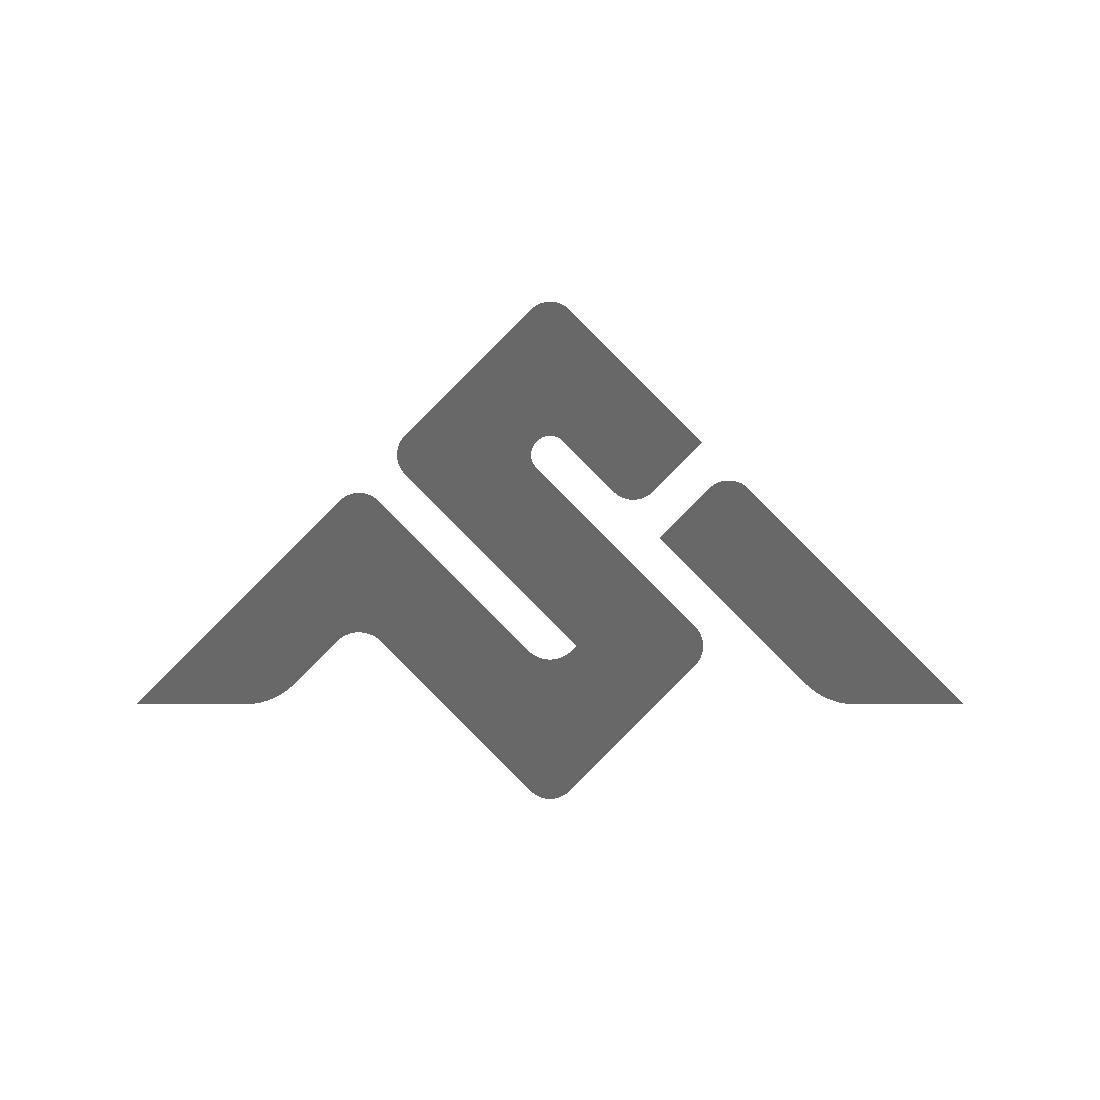 Sportmania Salomon Bbr Sunlite Ski Shop 2015 Online wZvYgWPxq